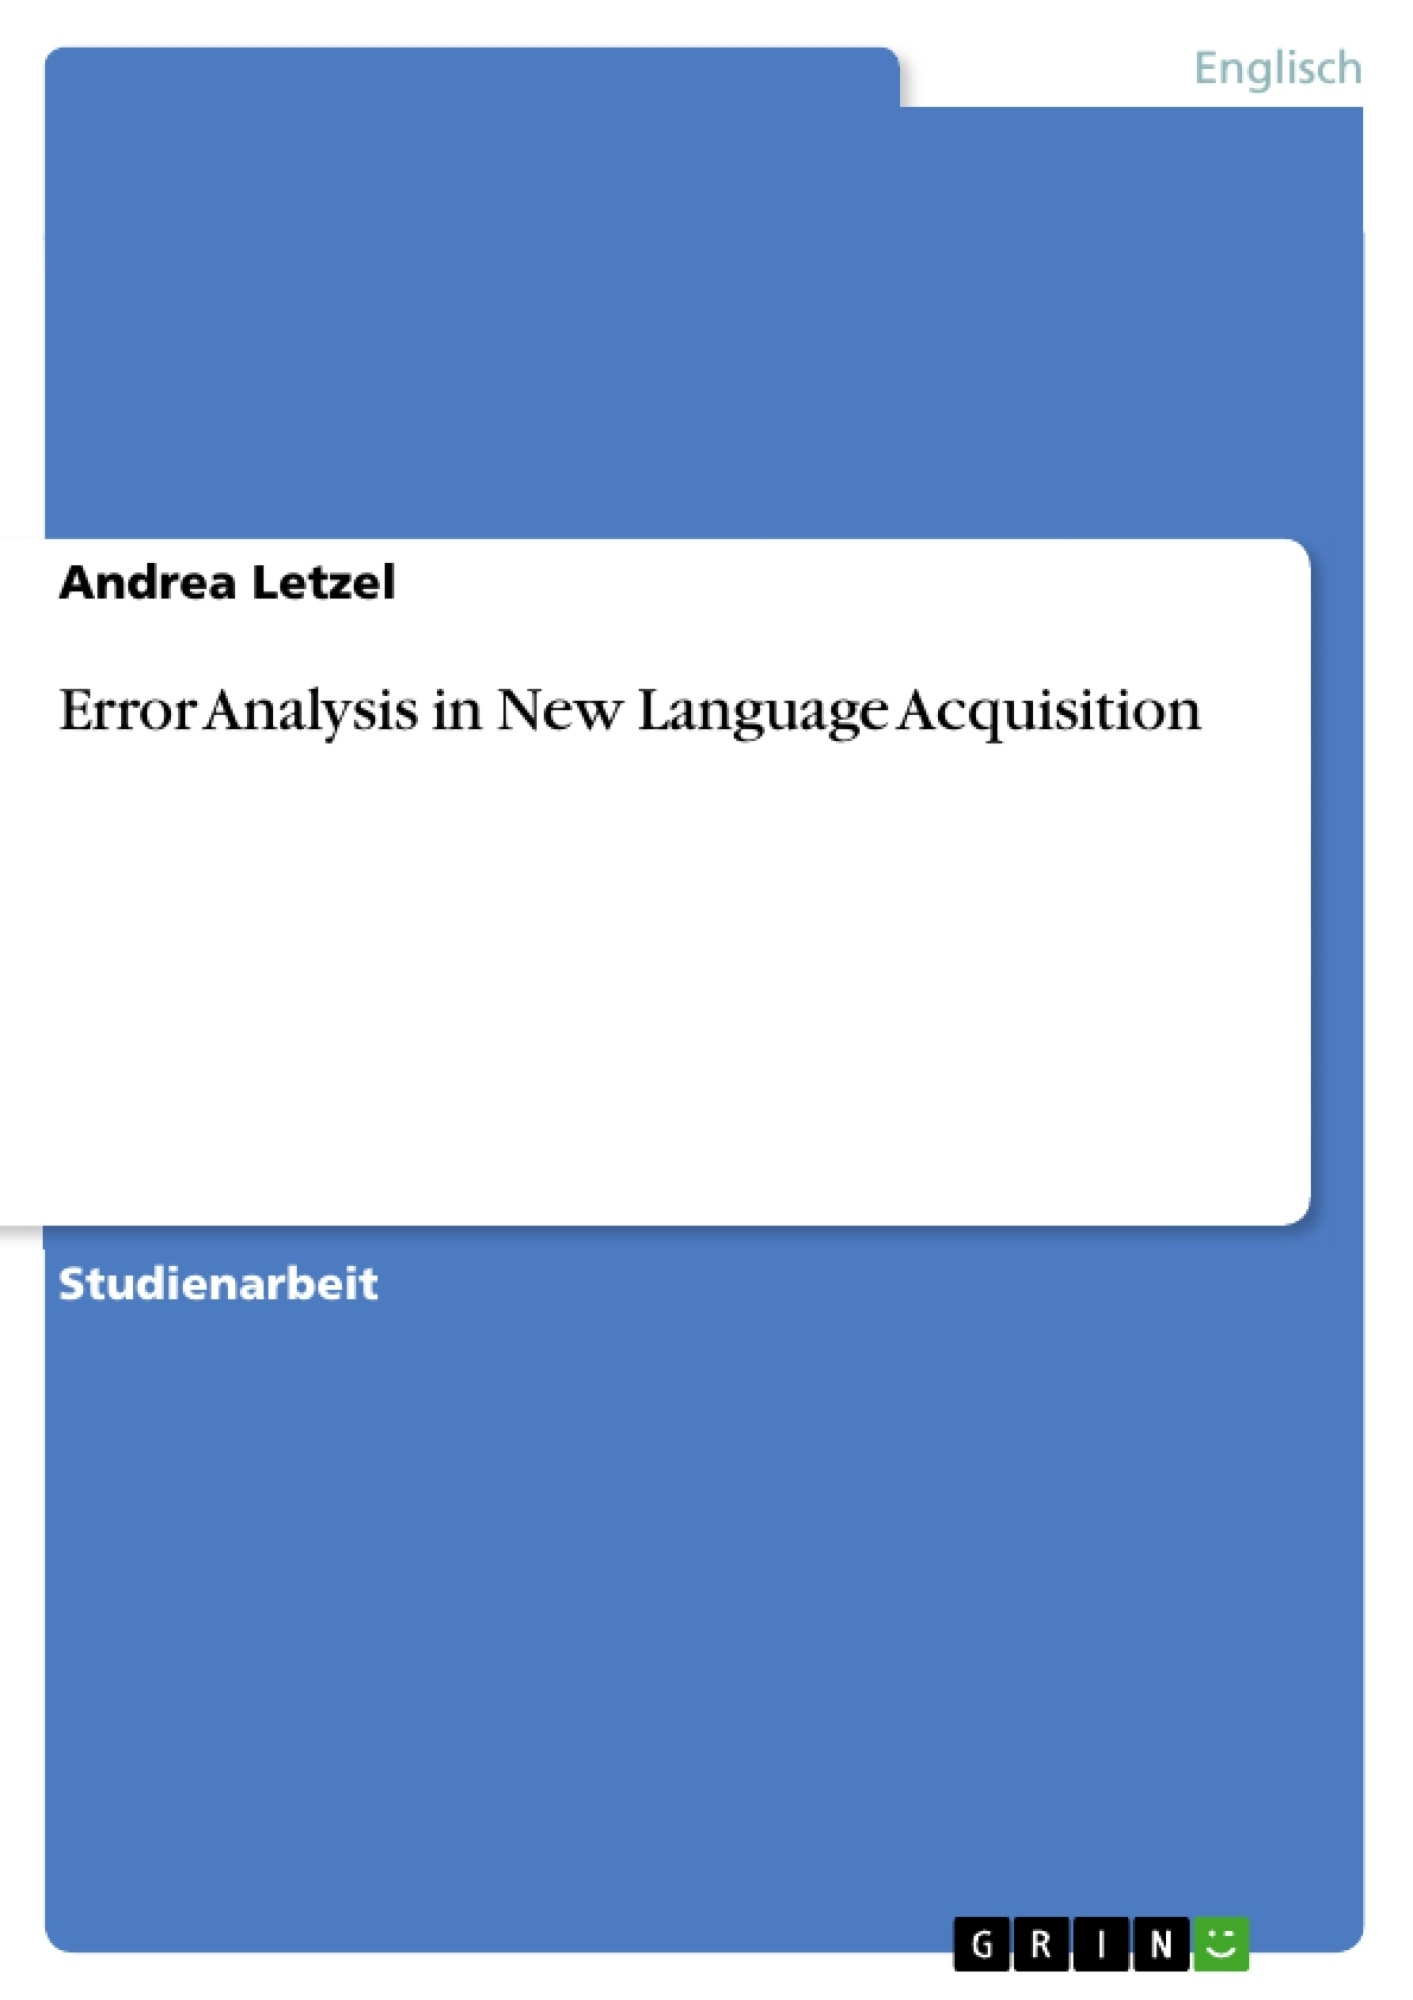 Titel: Error Analysis in New Language Acquisition